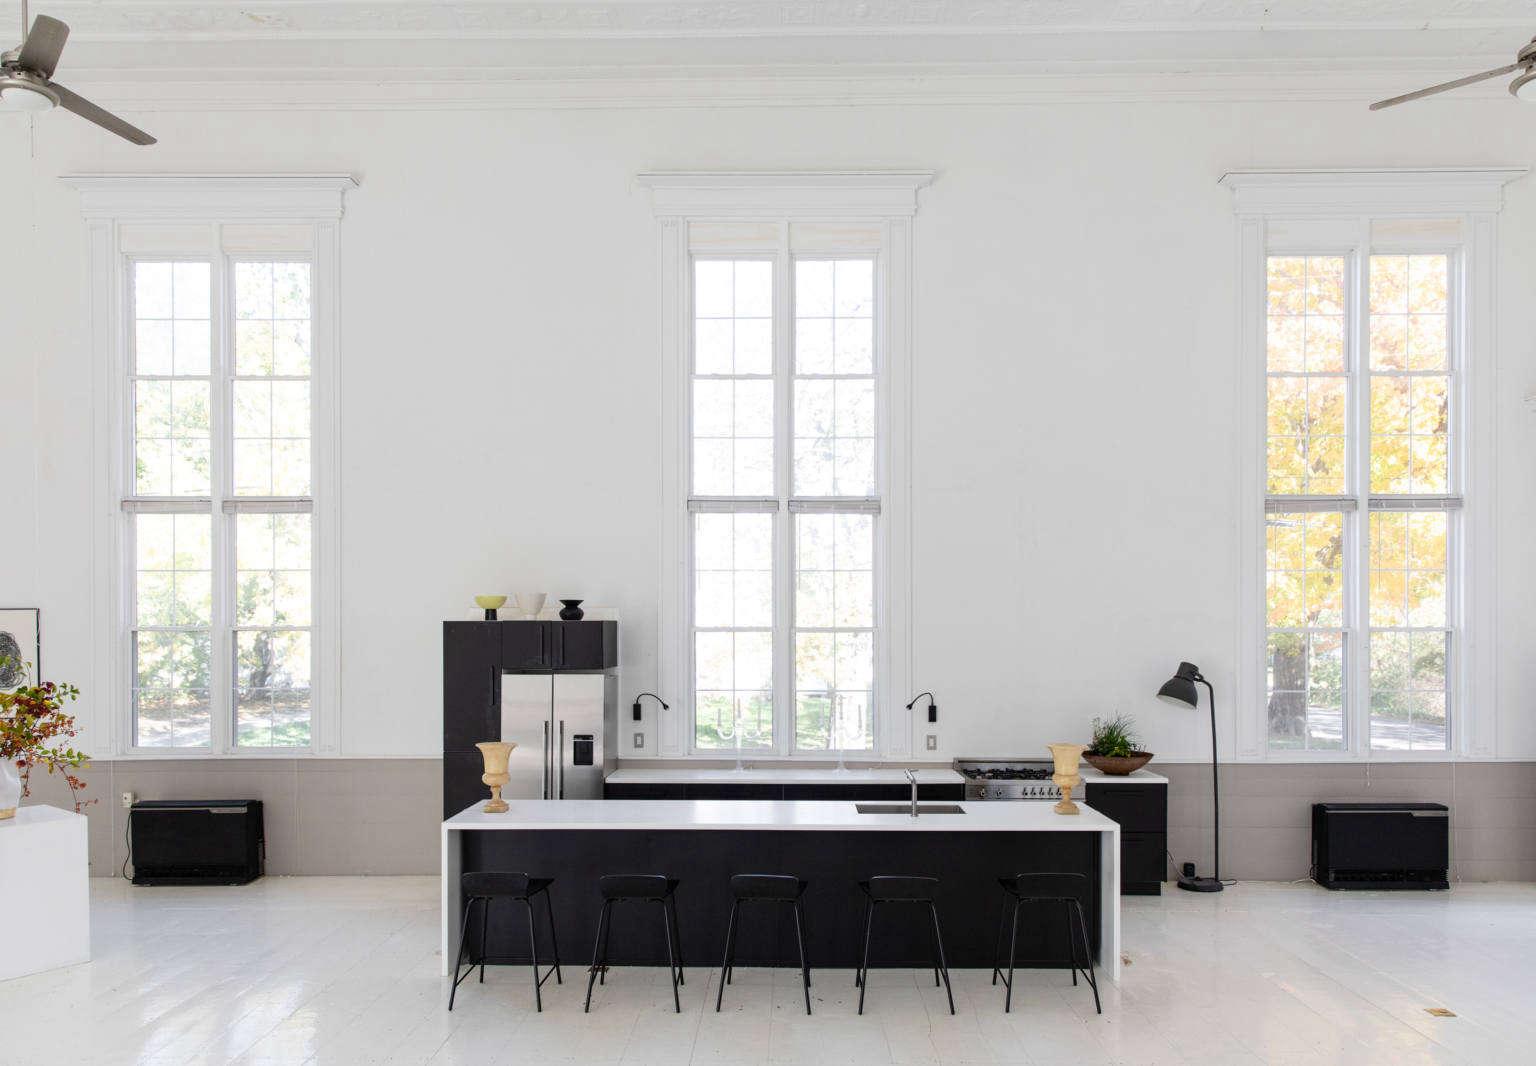 donna mcneil main room kitchen 2 rockland greta rybus